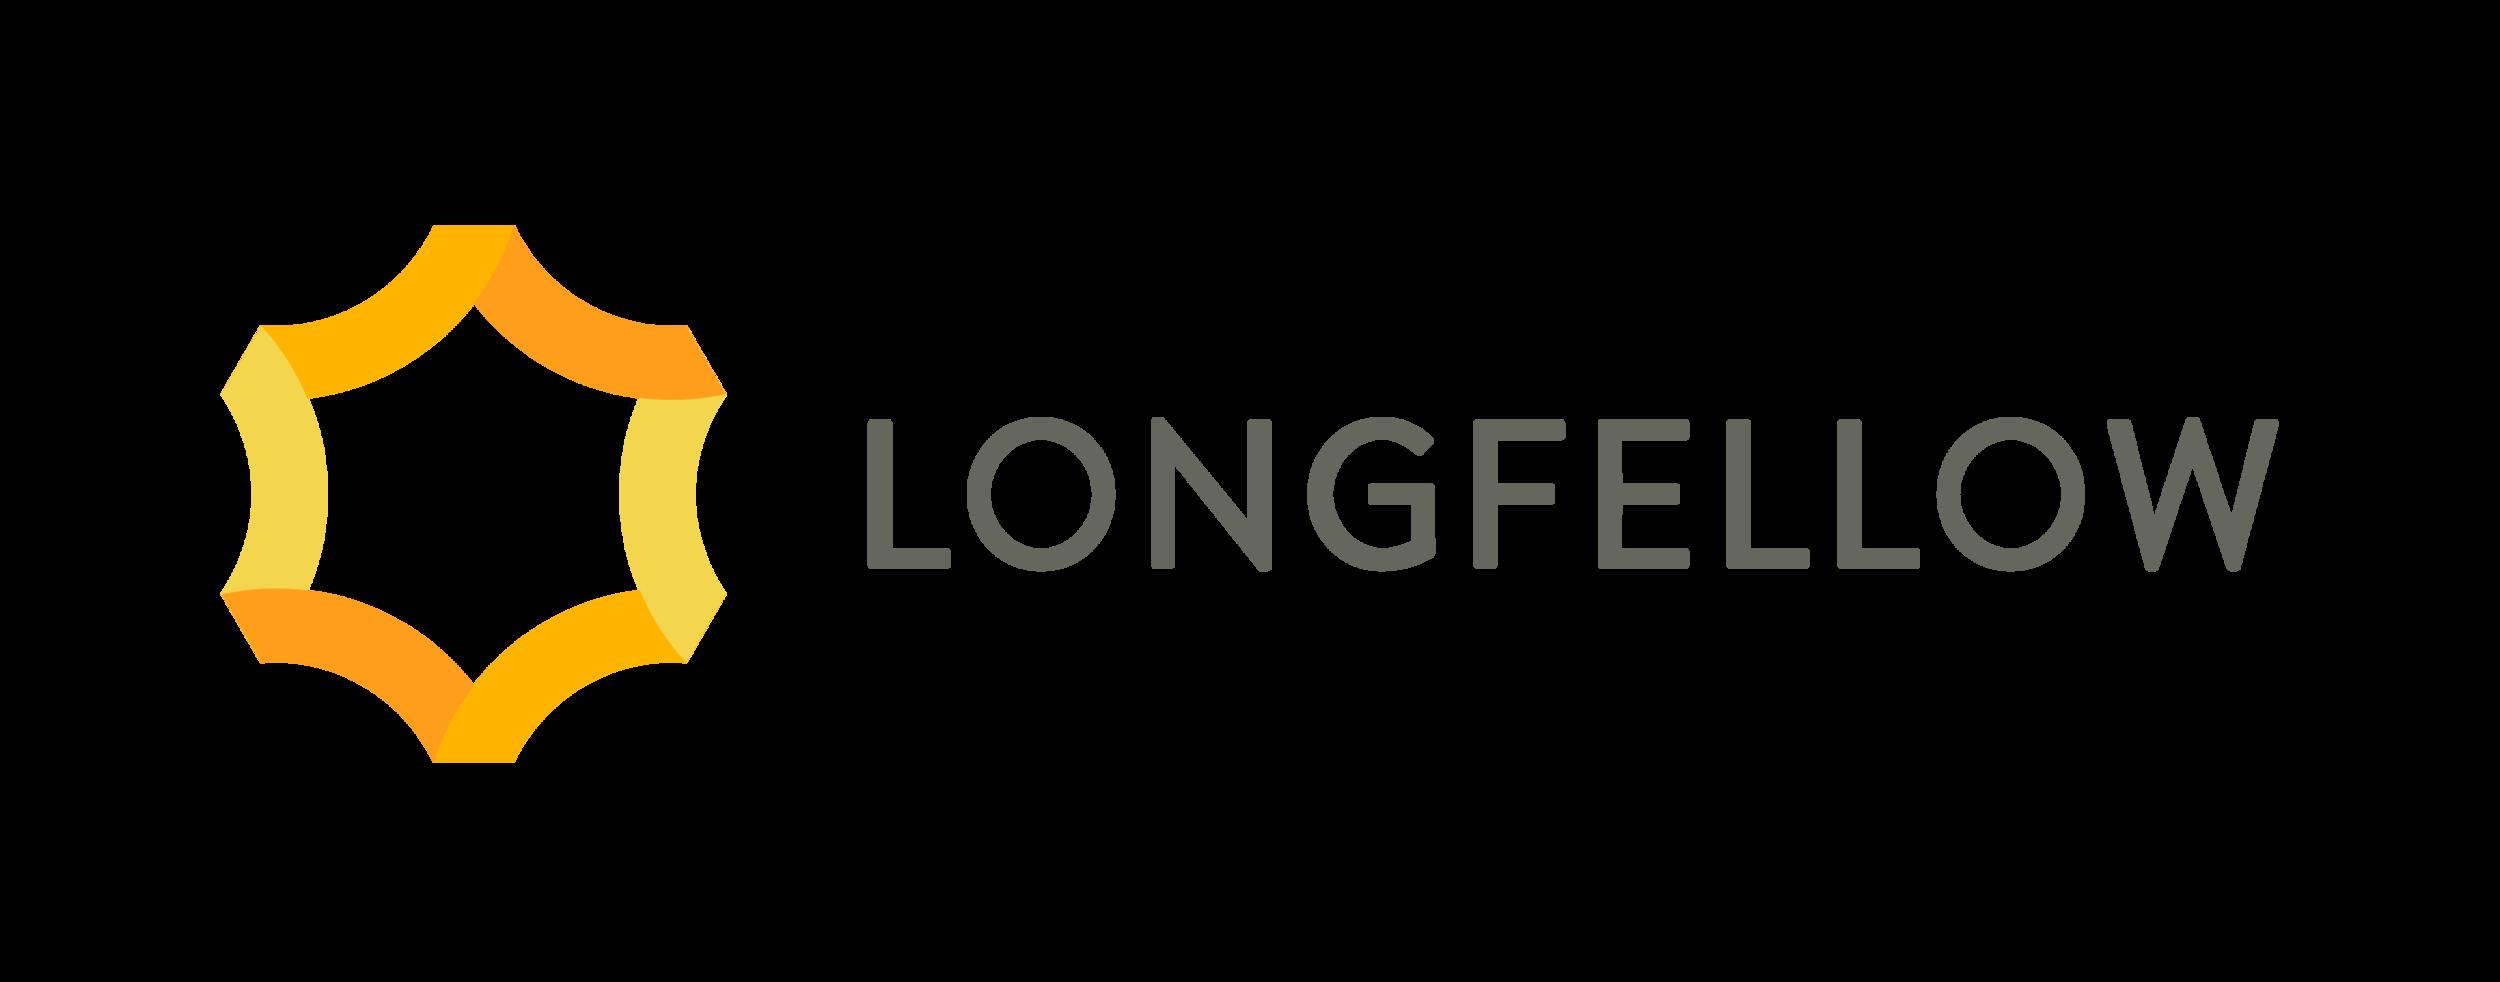 Longfellow_CorporateRebrand_FinalLogo_RGB[2].png